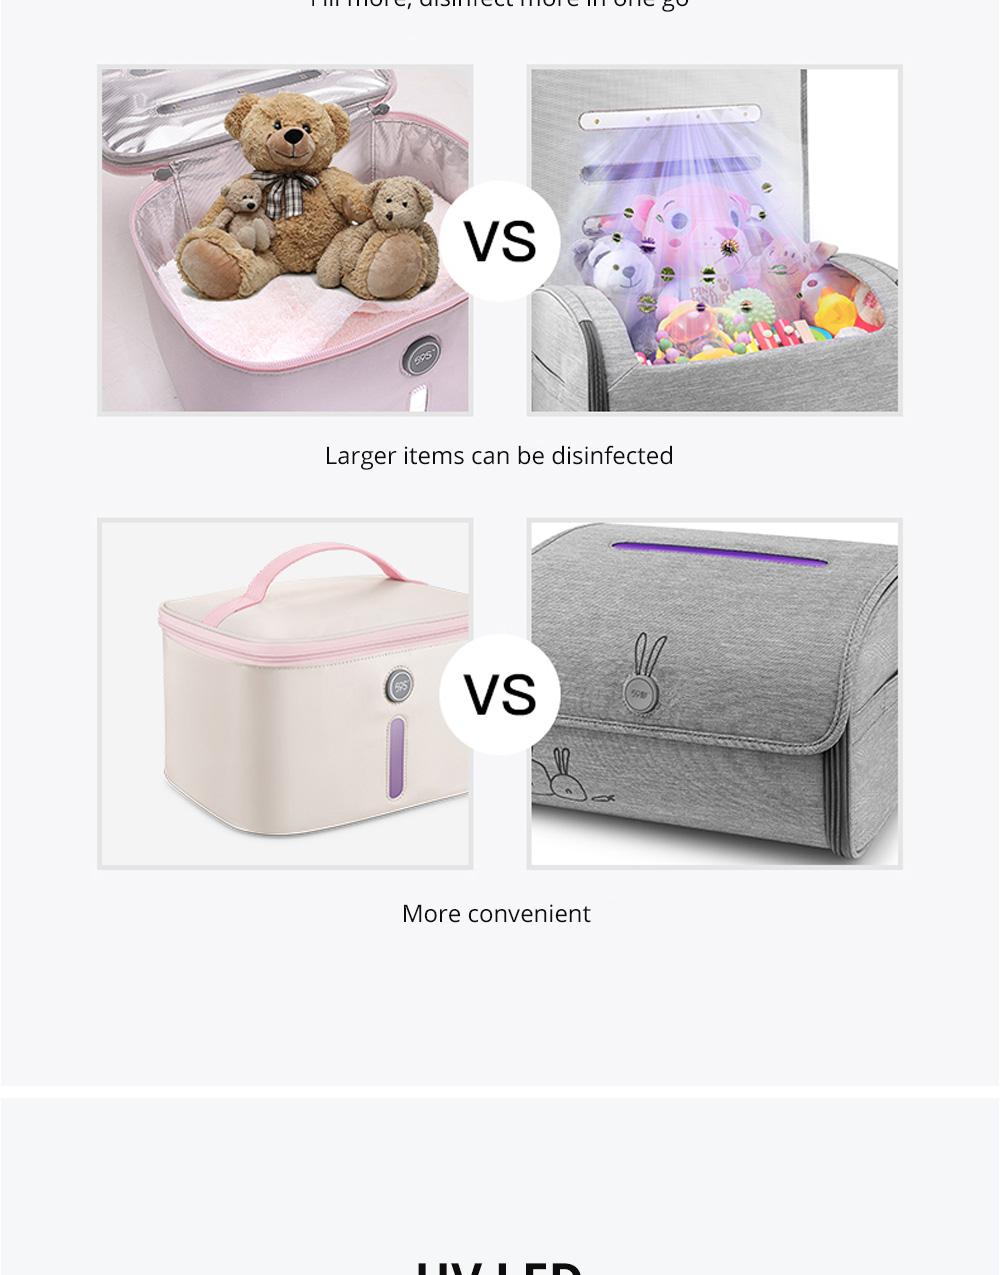 59 Second Sterilizer Household Baby Sterilizer Baby Toy Bottle Sterilizer UV Sterilizer 3